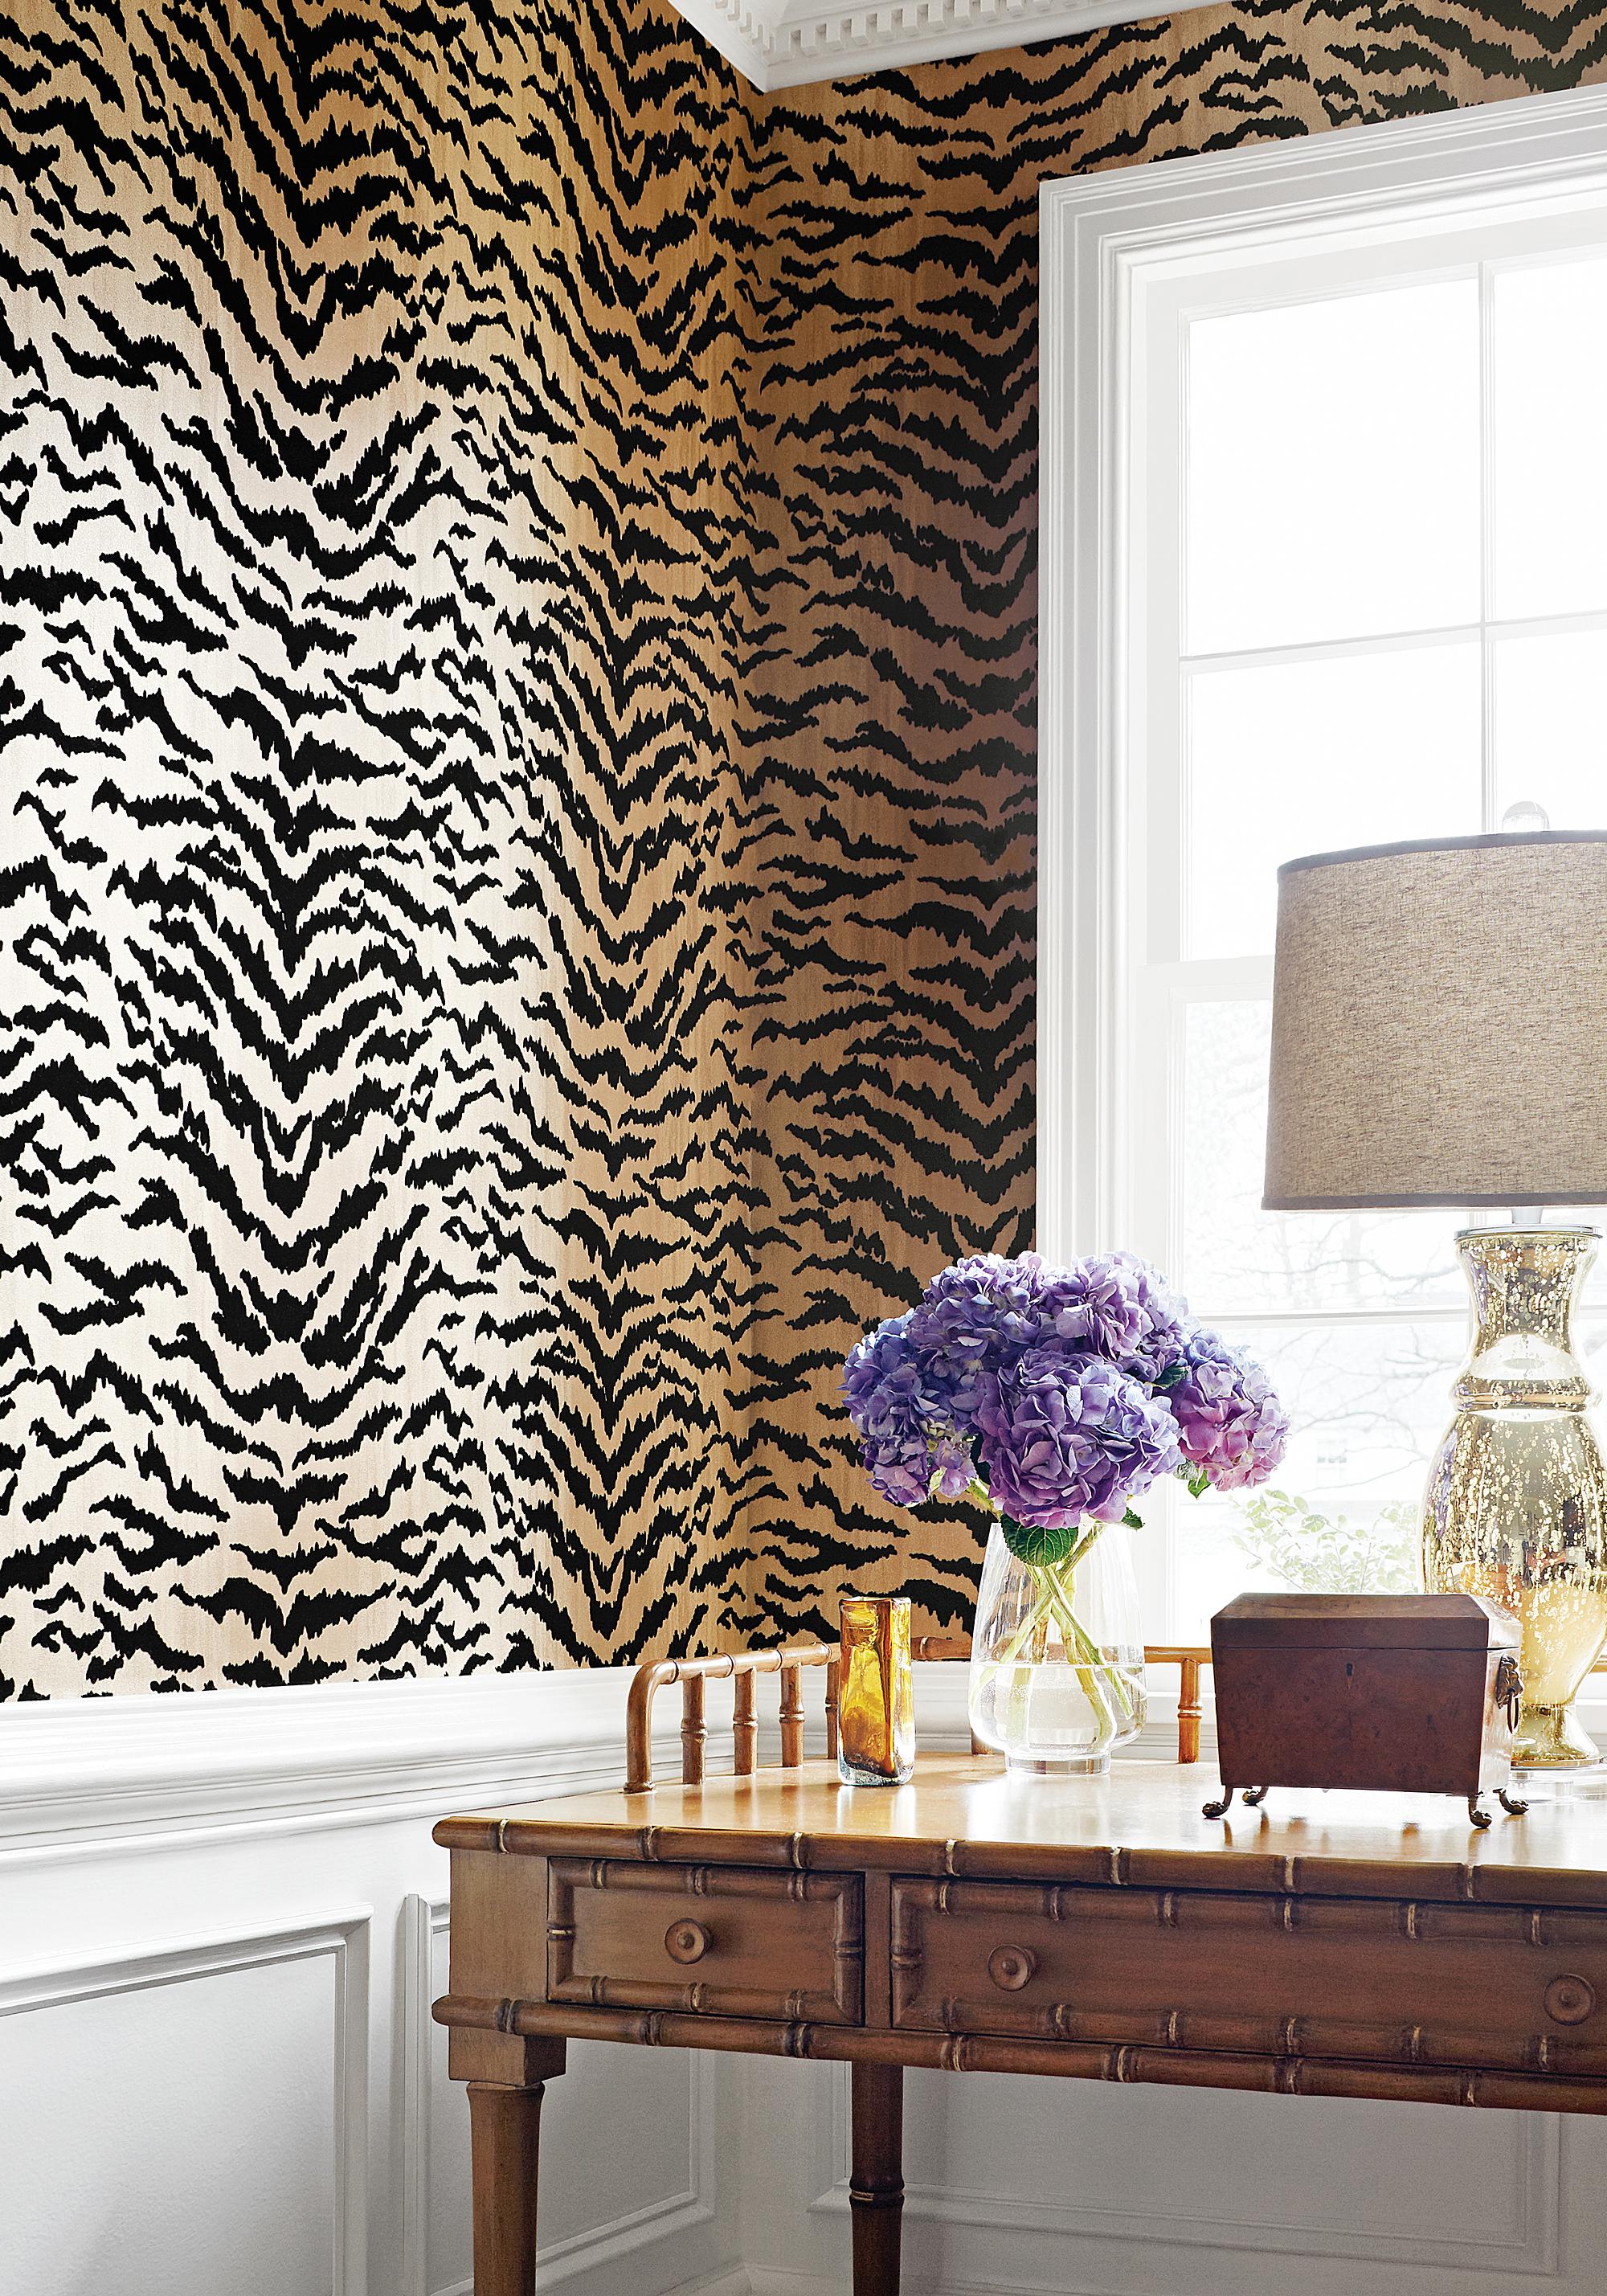 thibaut-design-tiger-wallpaper-animal-print-powder-room-washroom ...